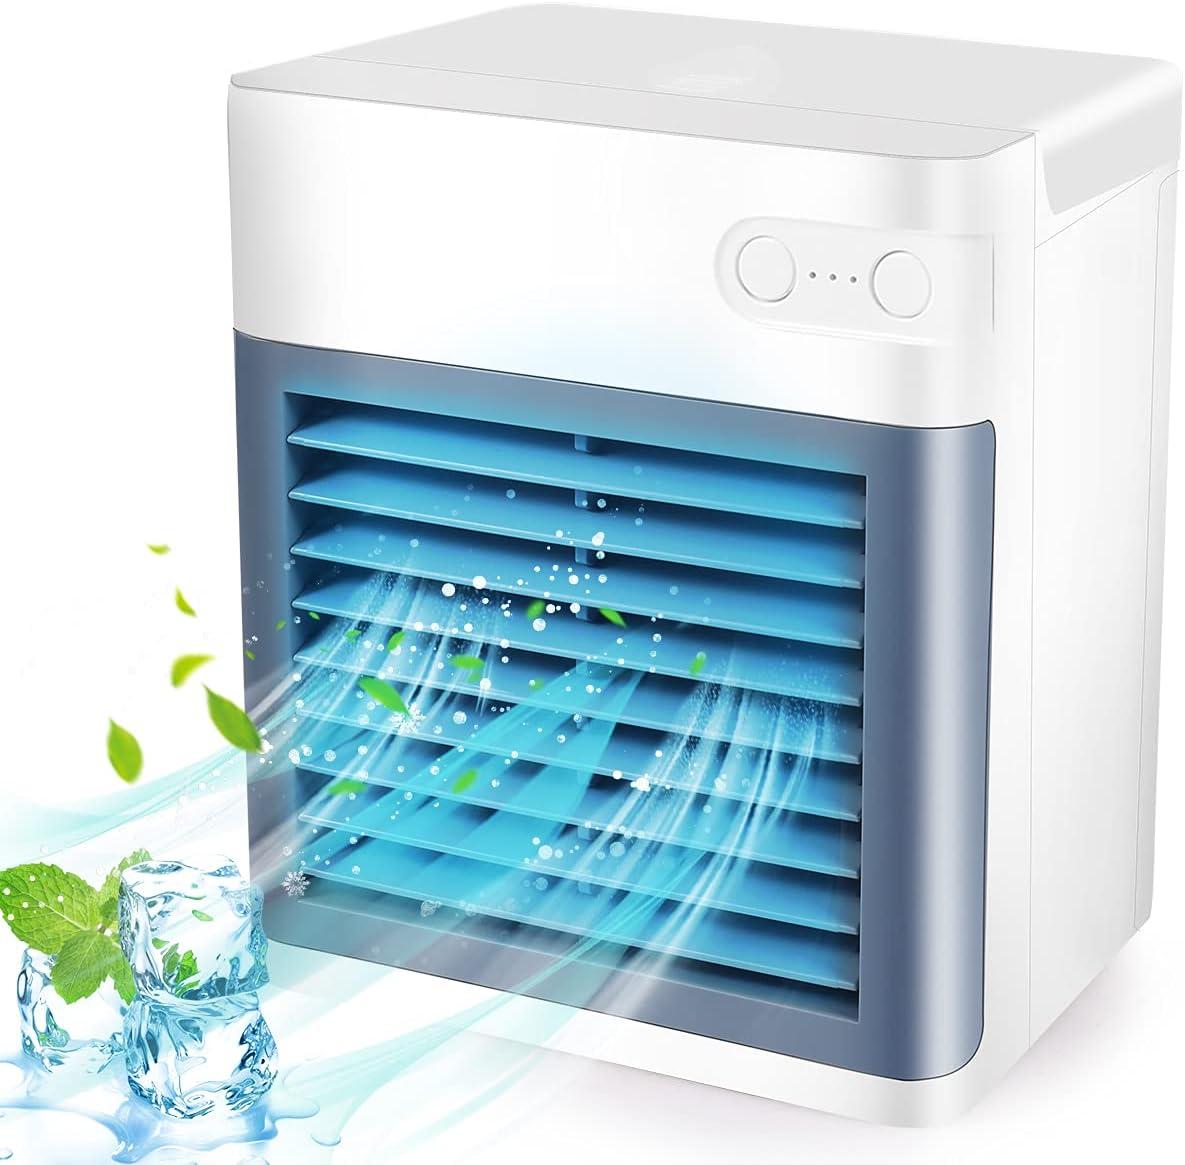 Max 49% OFF Portable Air Conditioner Personal Evaporative w Super Special SALE held Mini Cooler